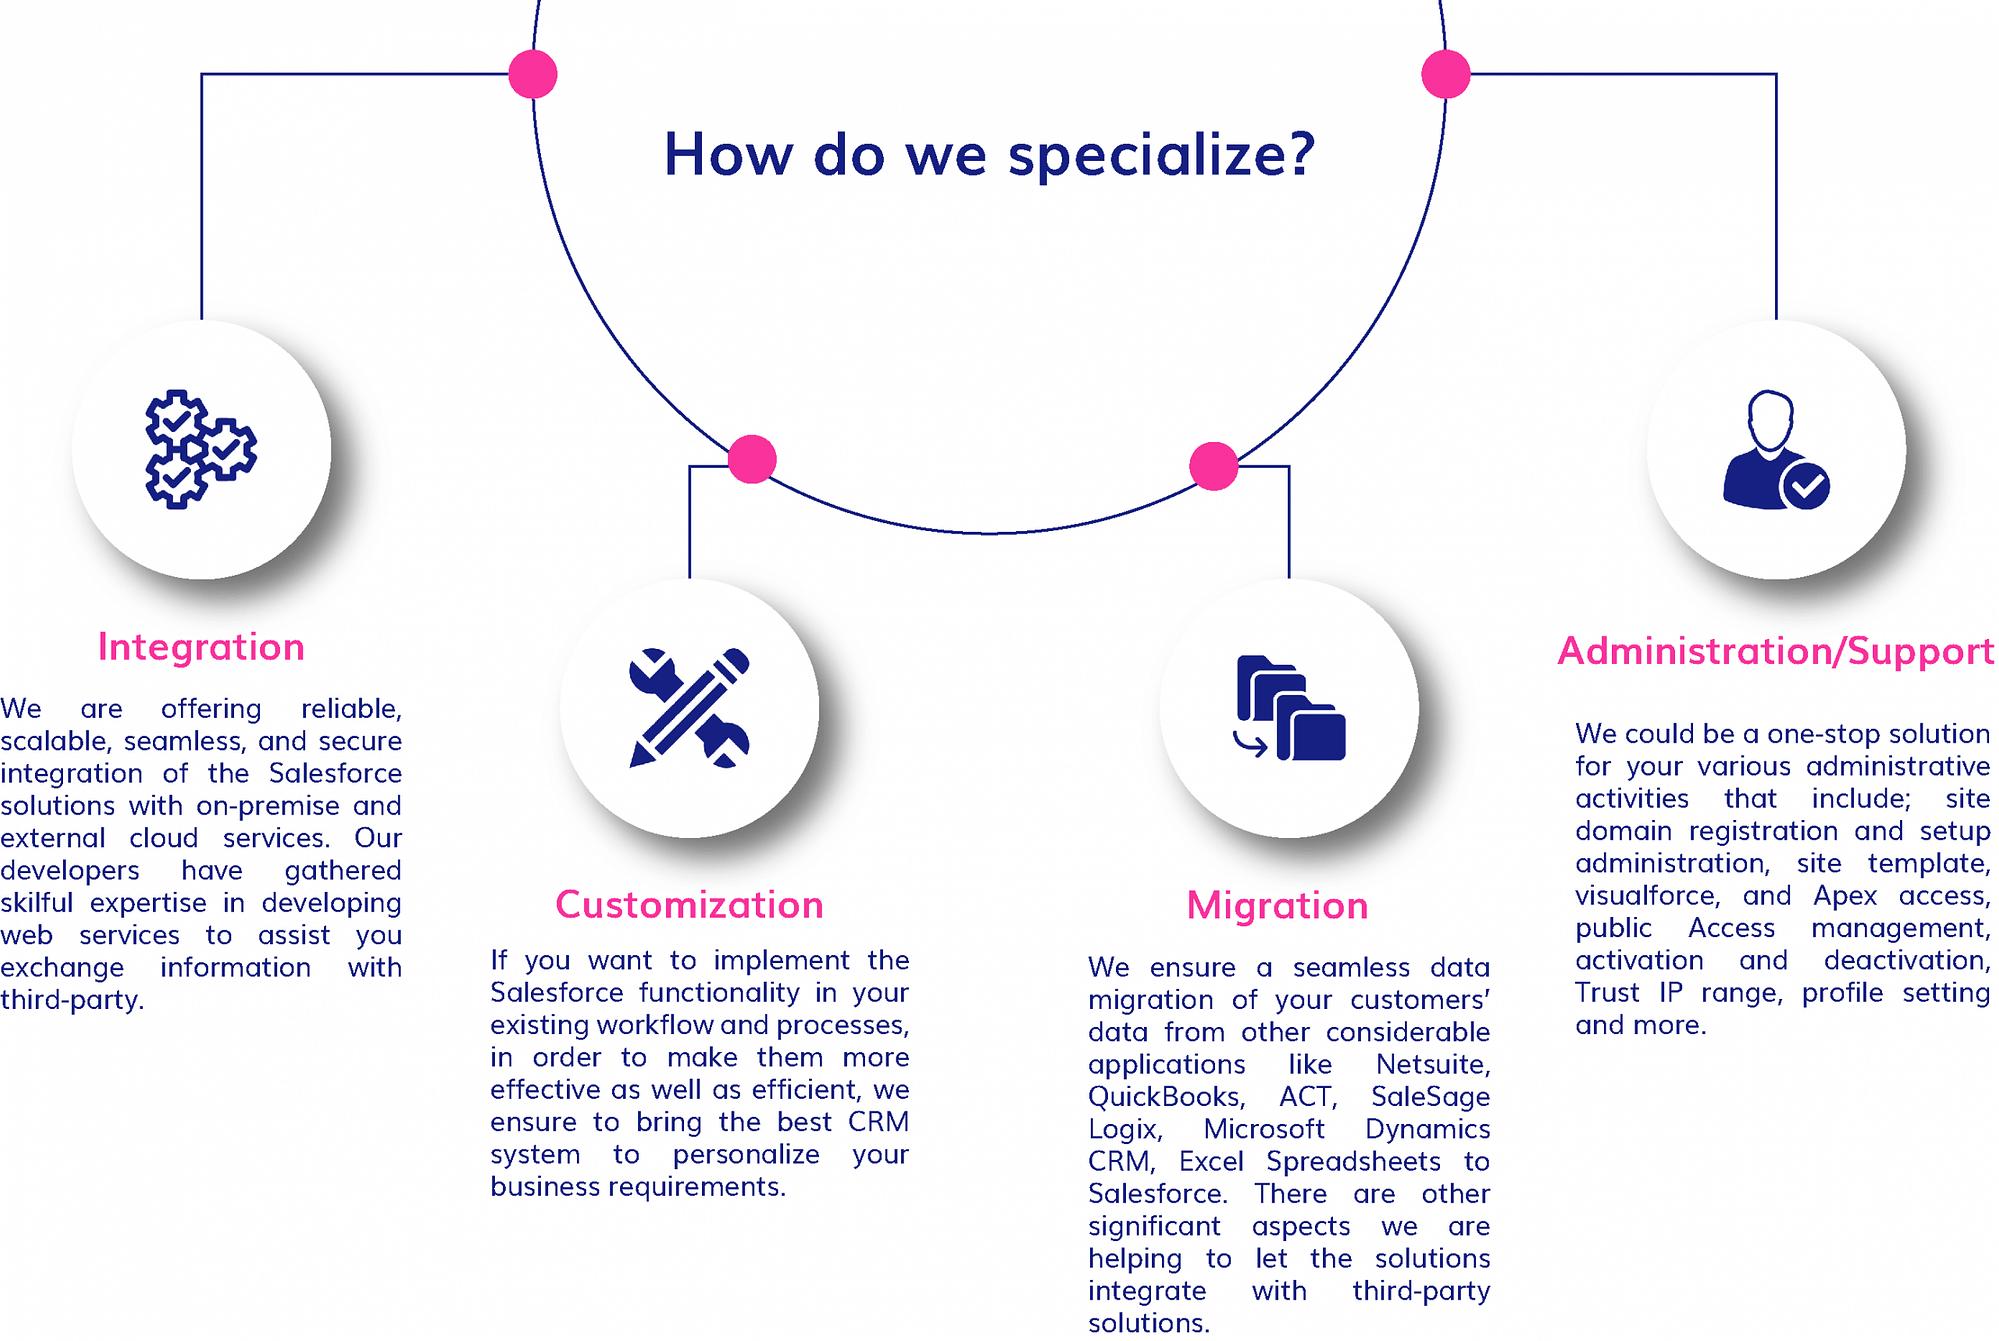 our salesforce development services specialization